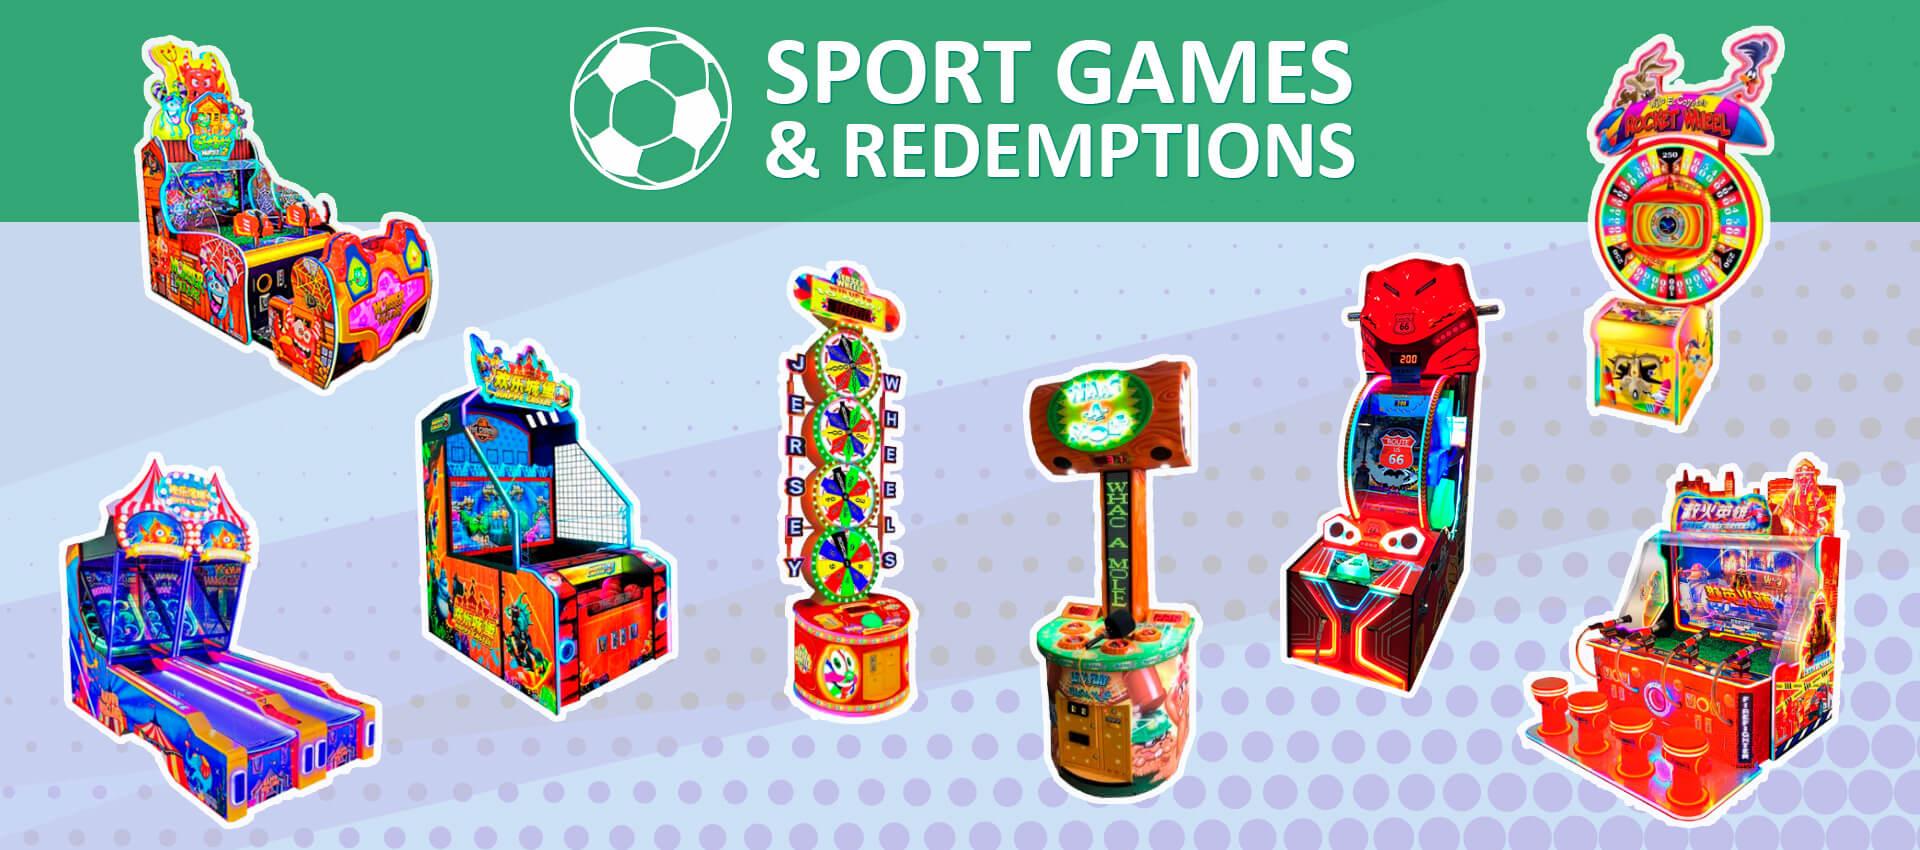 Sport Games & Redemptions